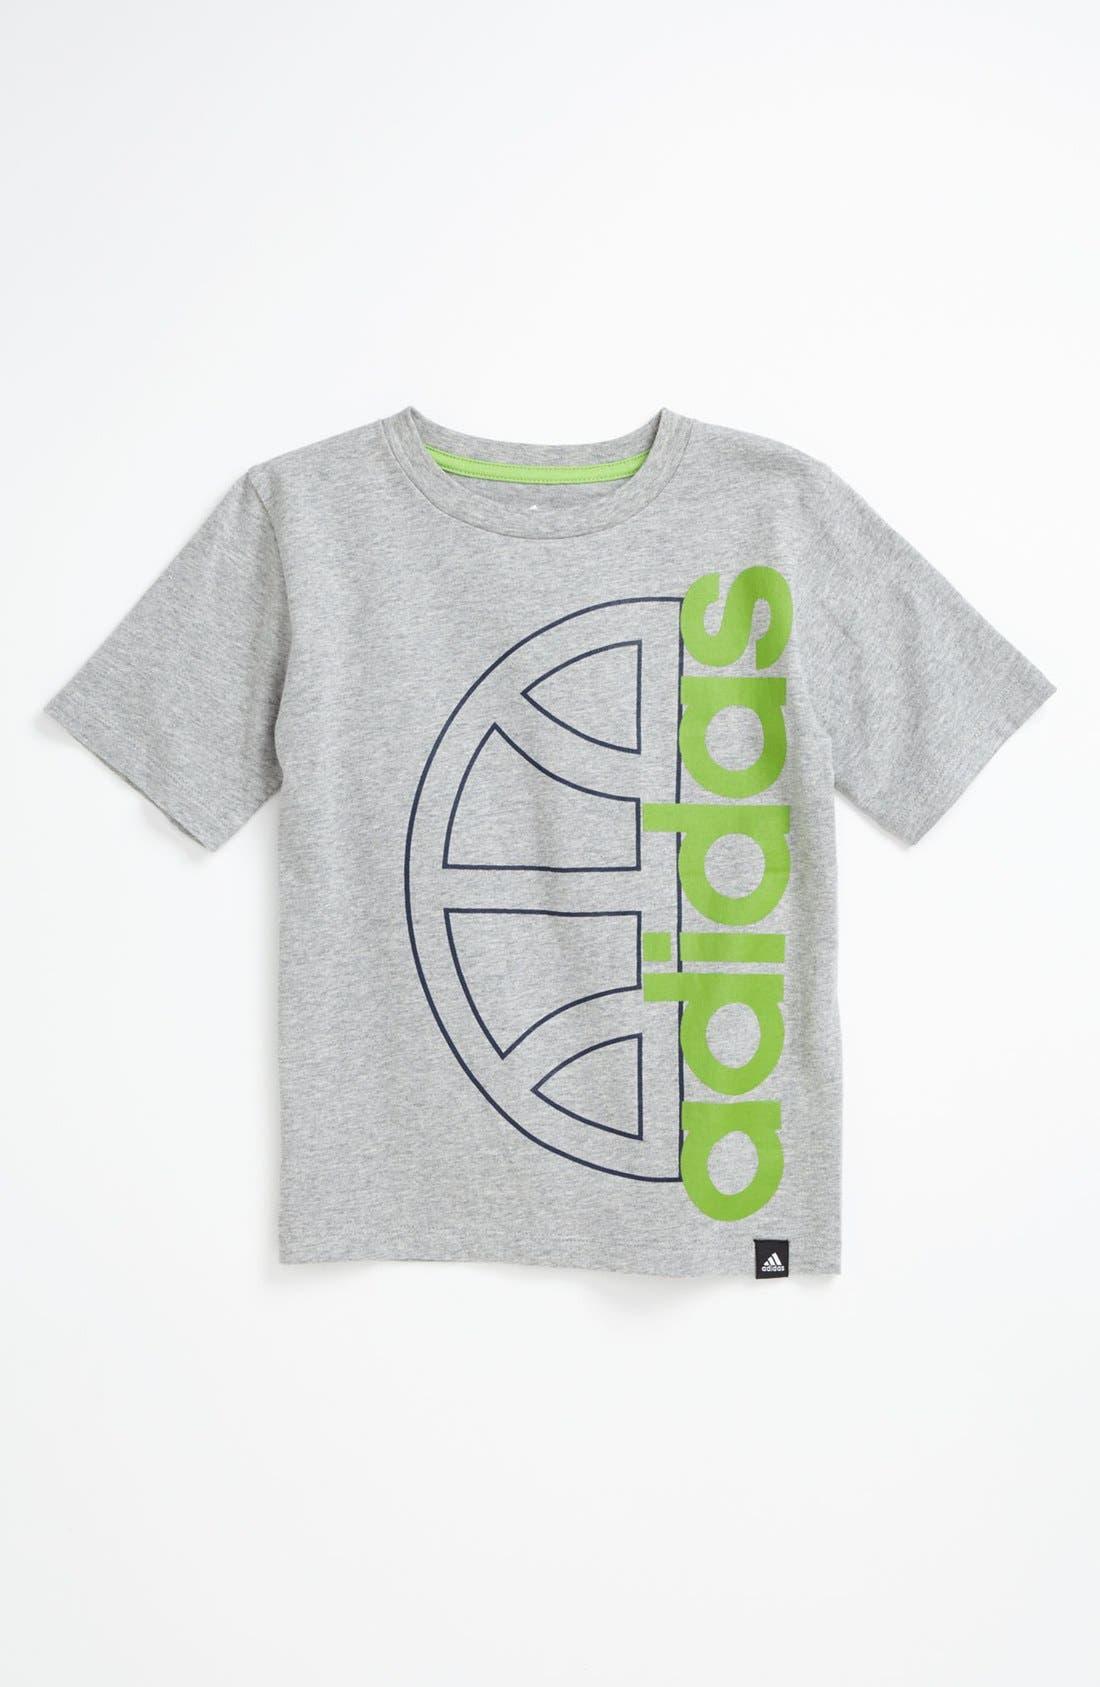 Alternate Image 1 Selected - adidas 'Ballin' T-Shirt (Little Boys)